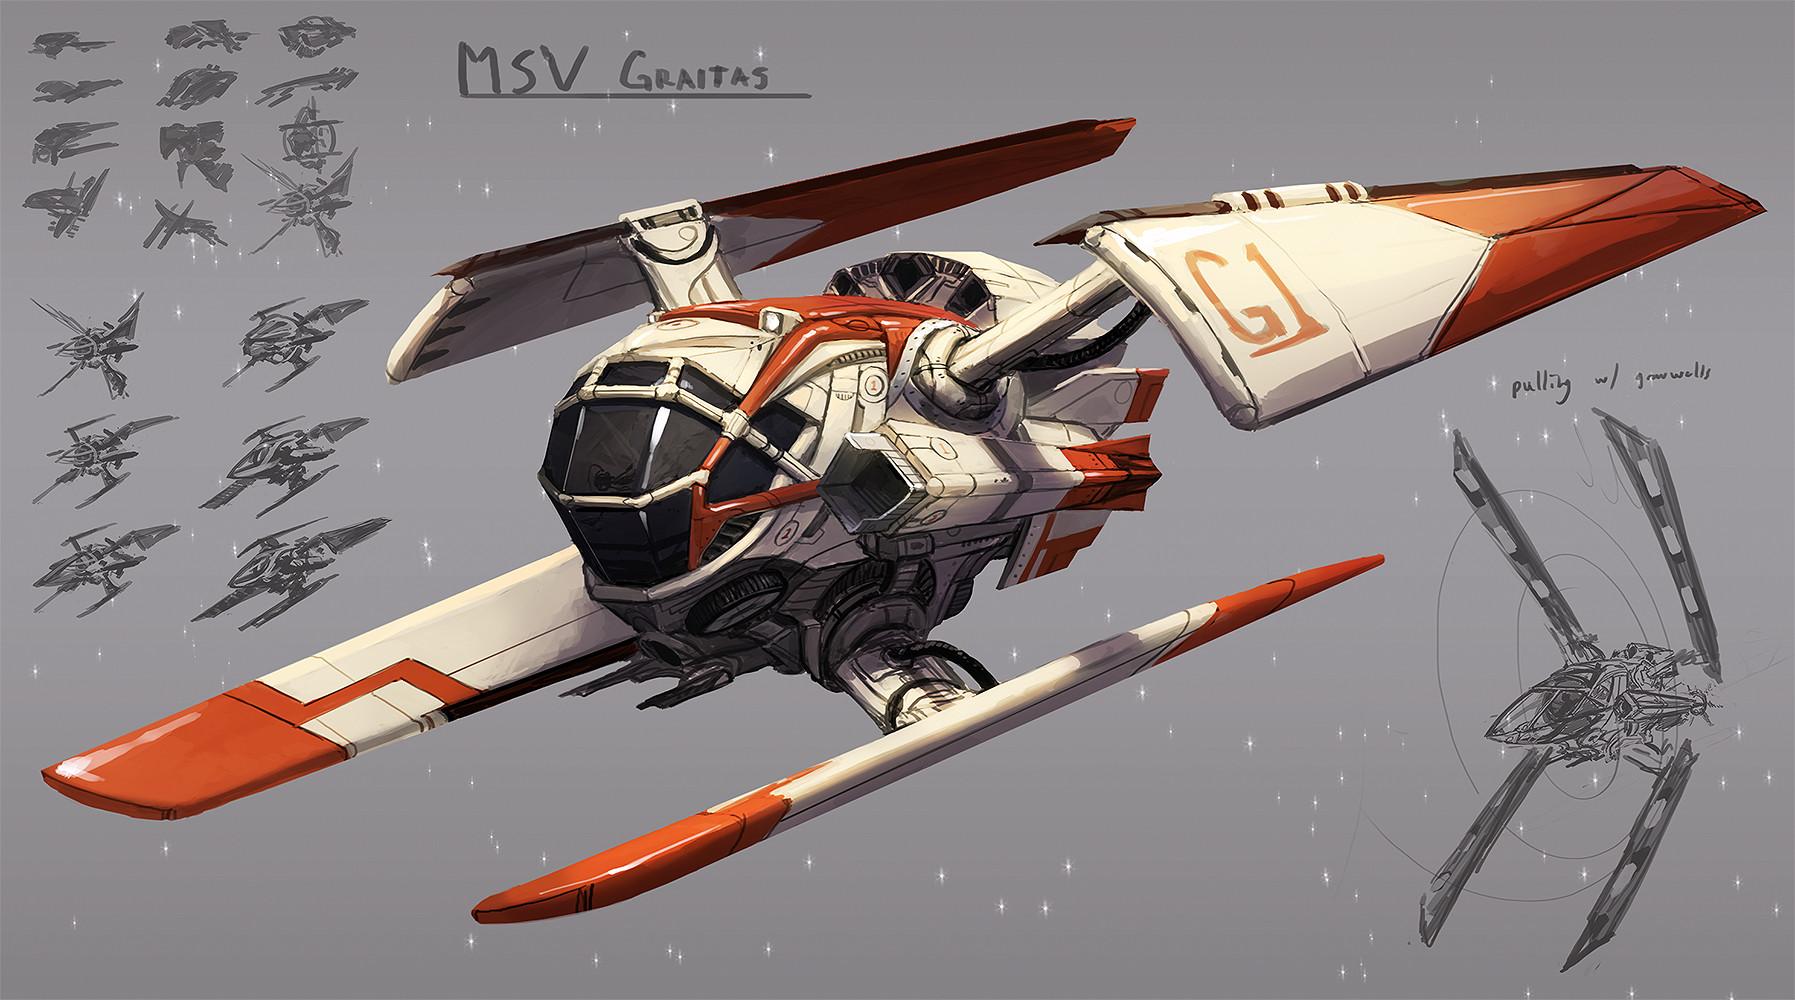 kez-laczin-bw-spaceshipfin01.jpg?1489765